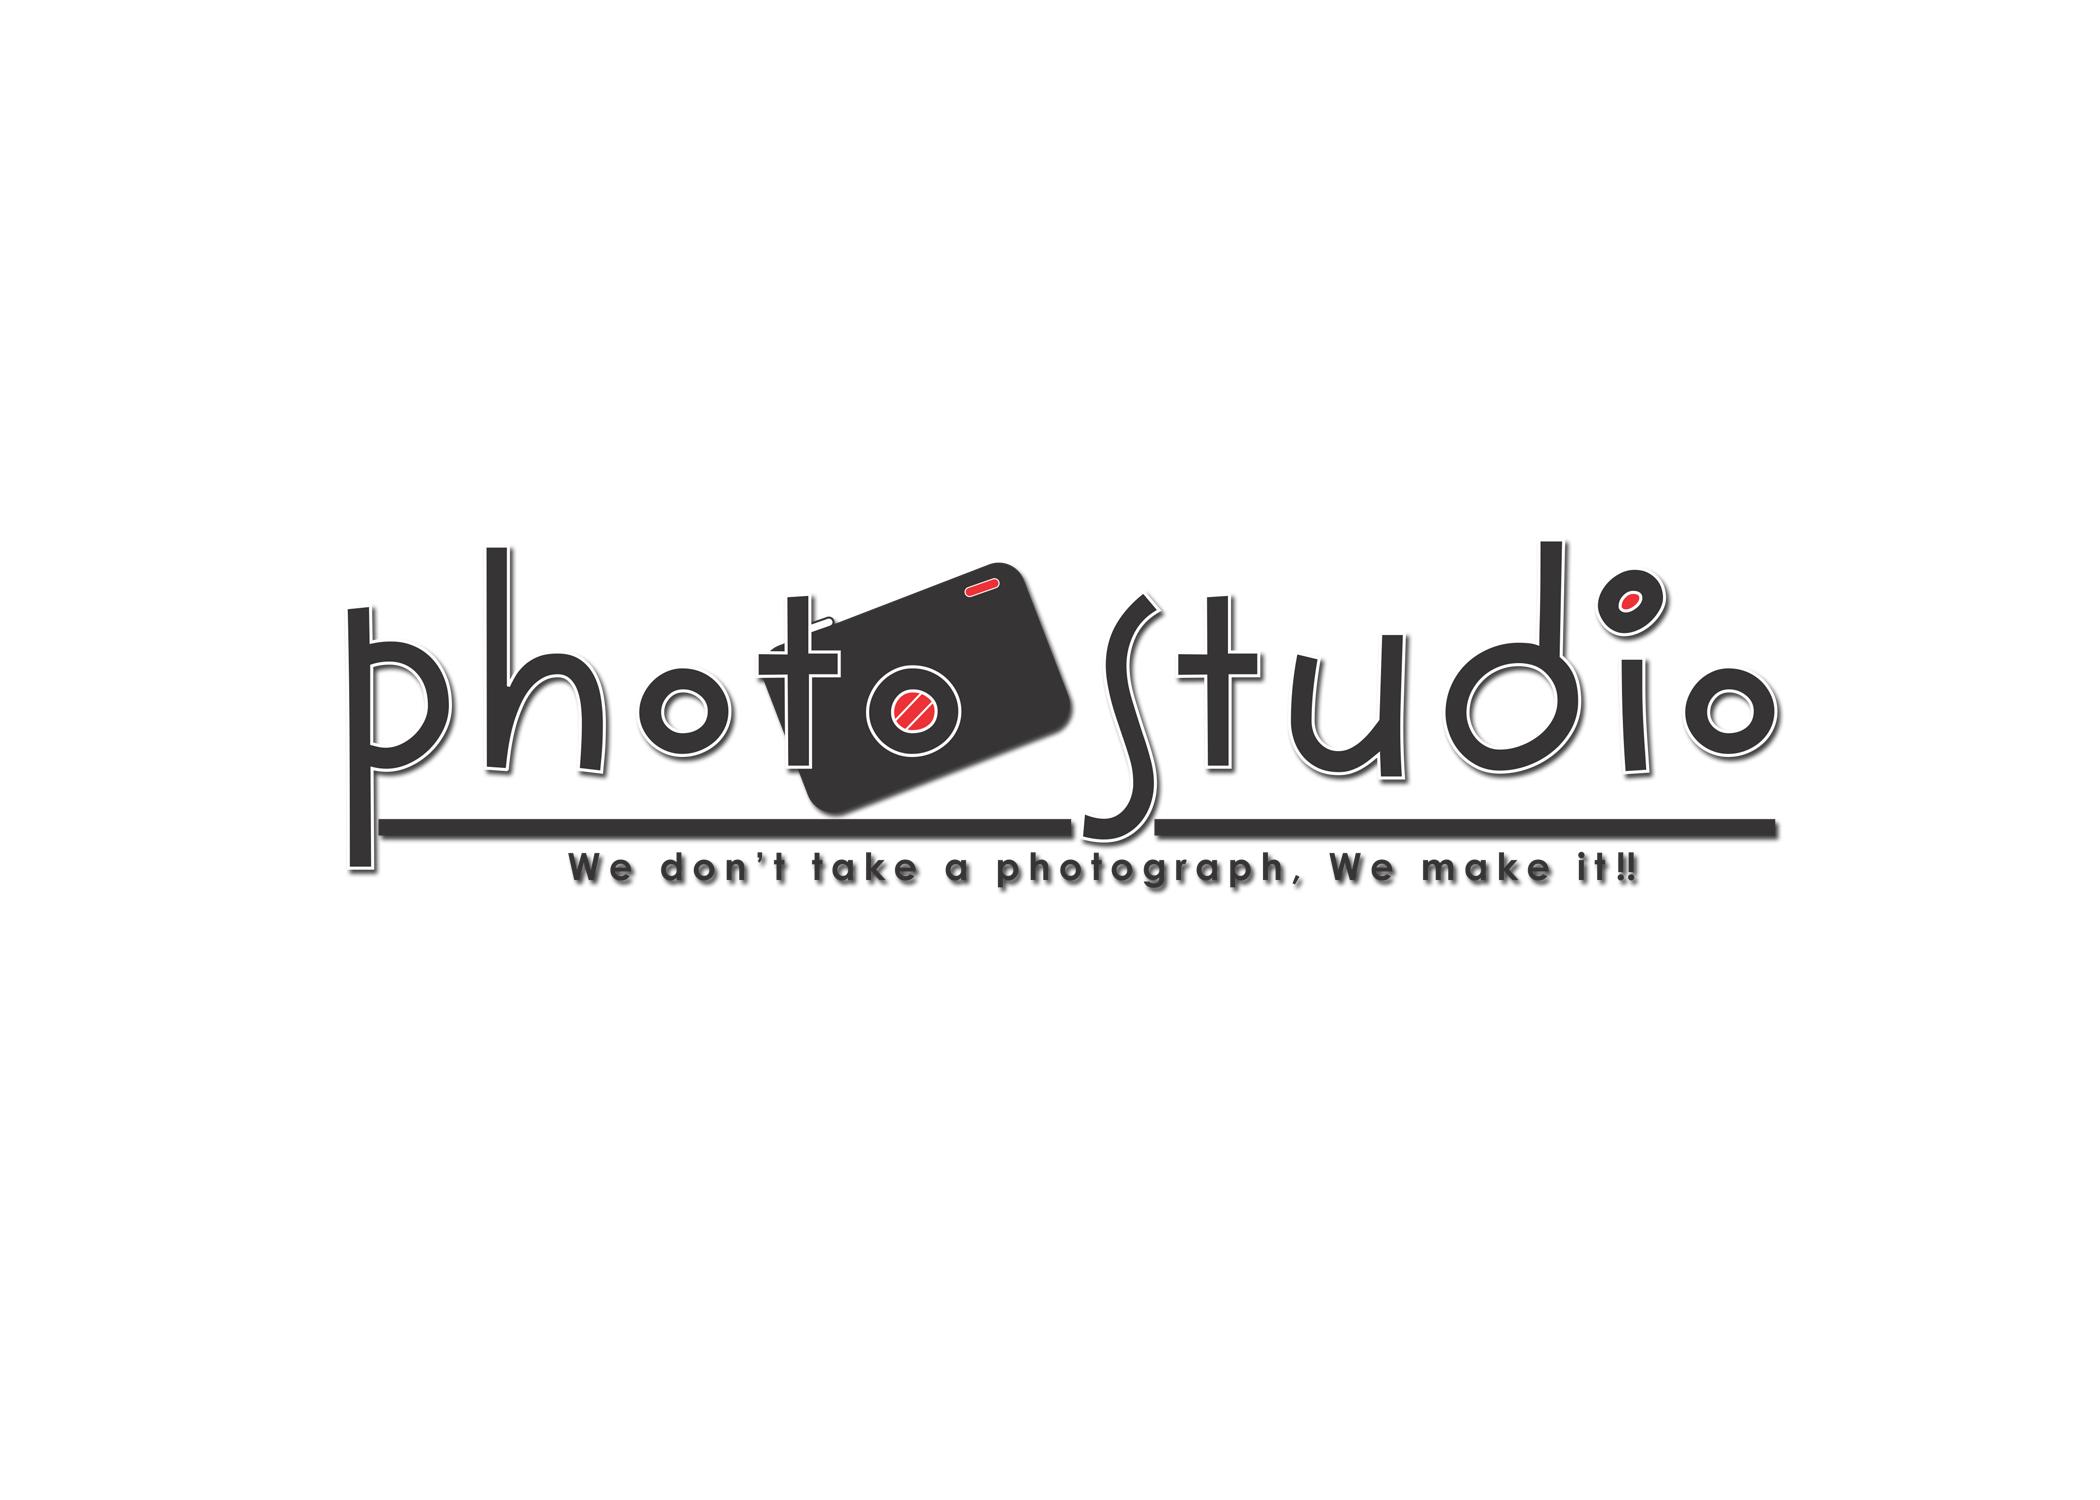 photo studio logo by kbkb143 designs interfaces logos logotypes 2012 ...